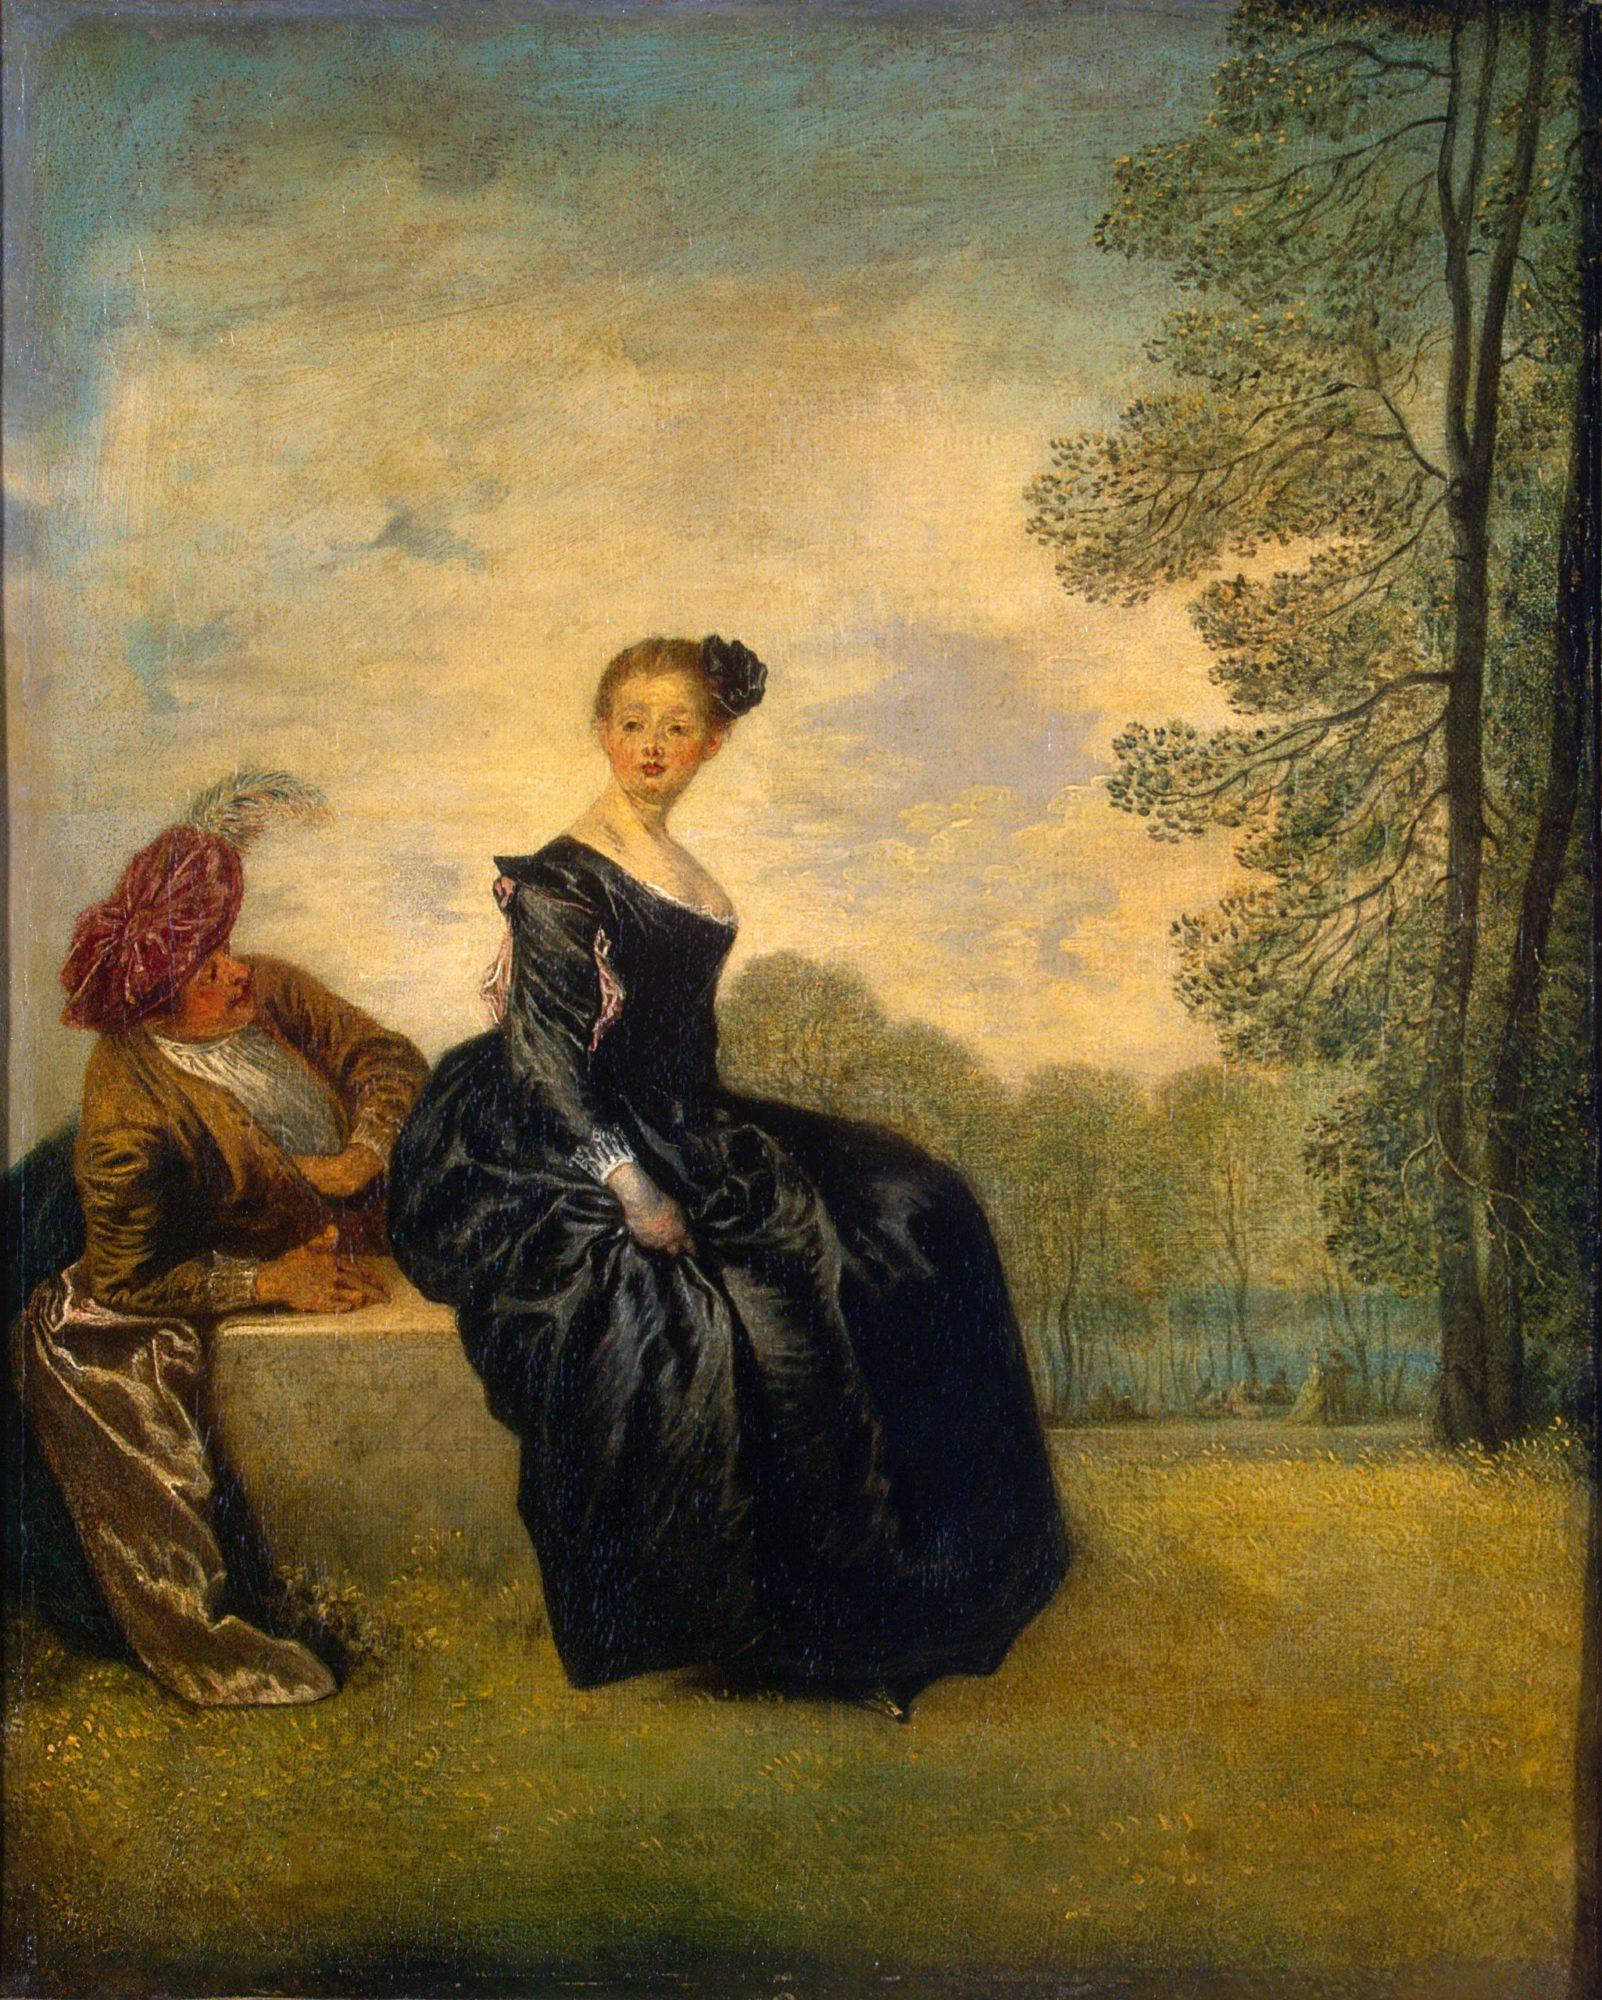 Капризница. Антуан Ватто, 1718 год, Эрмитаж, Санкт-Петербург.